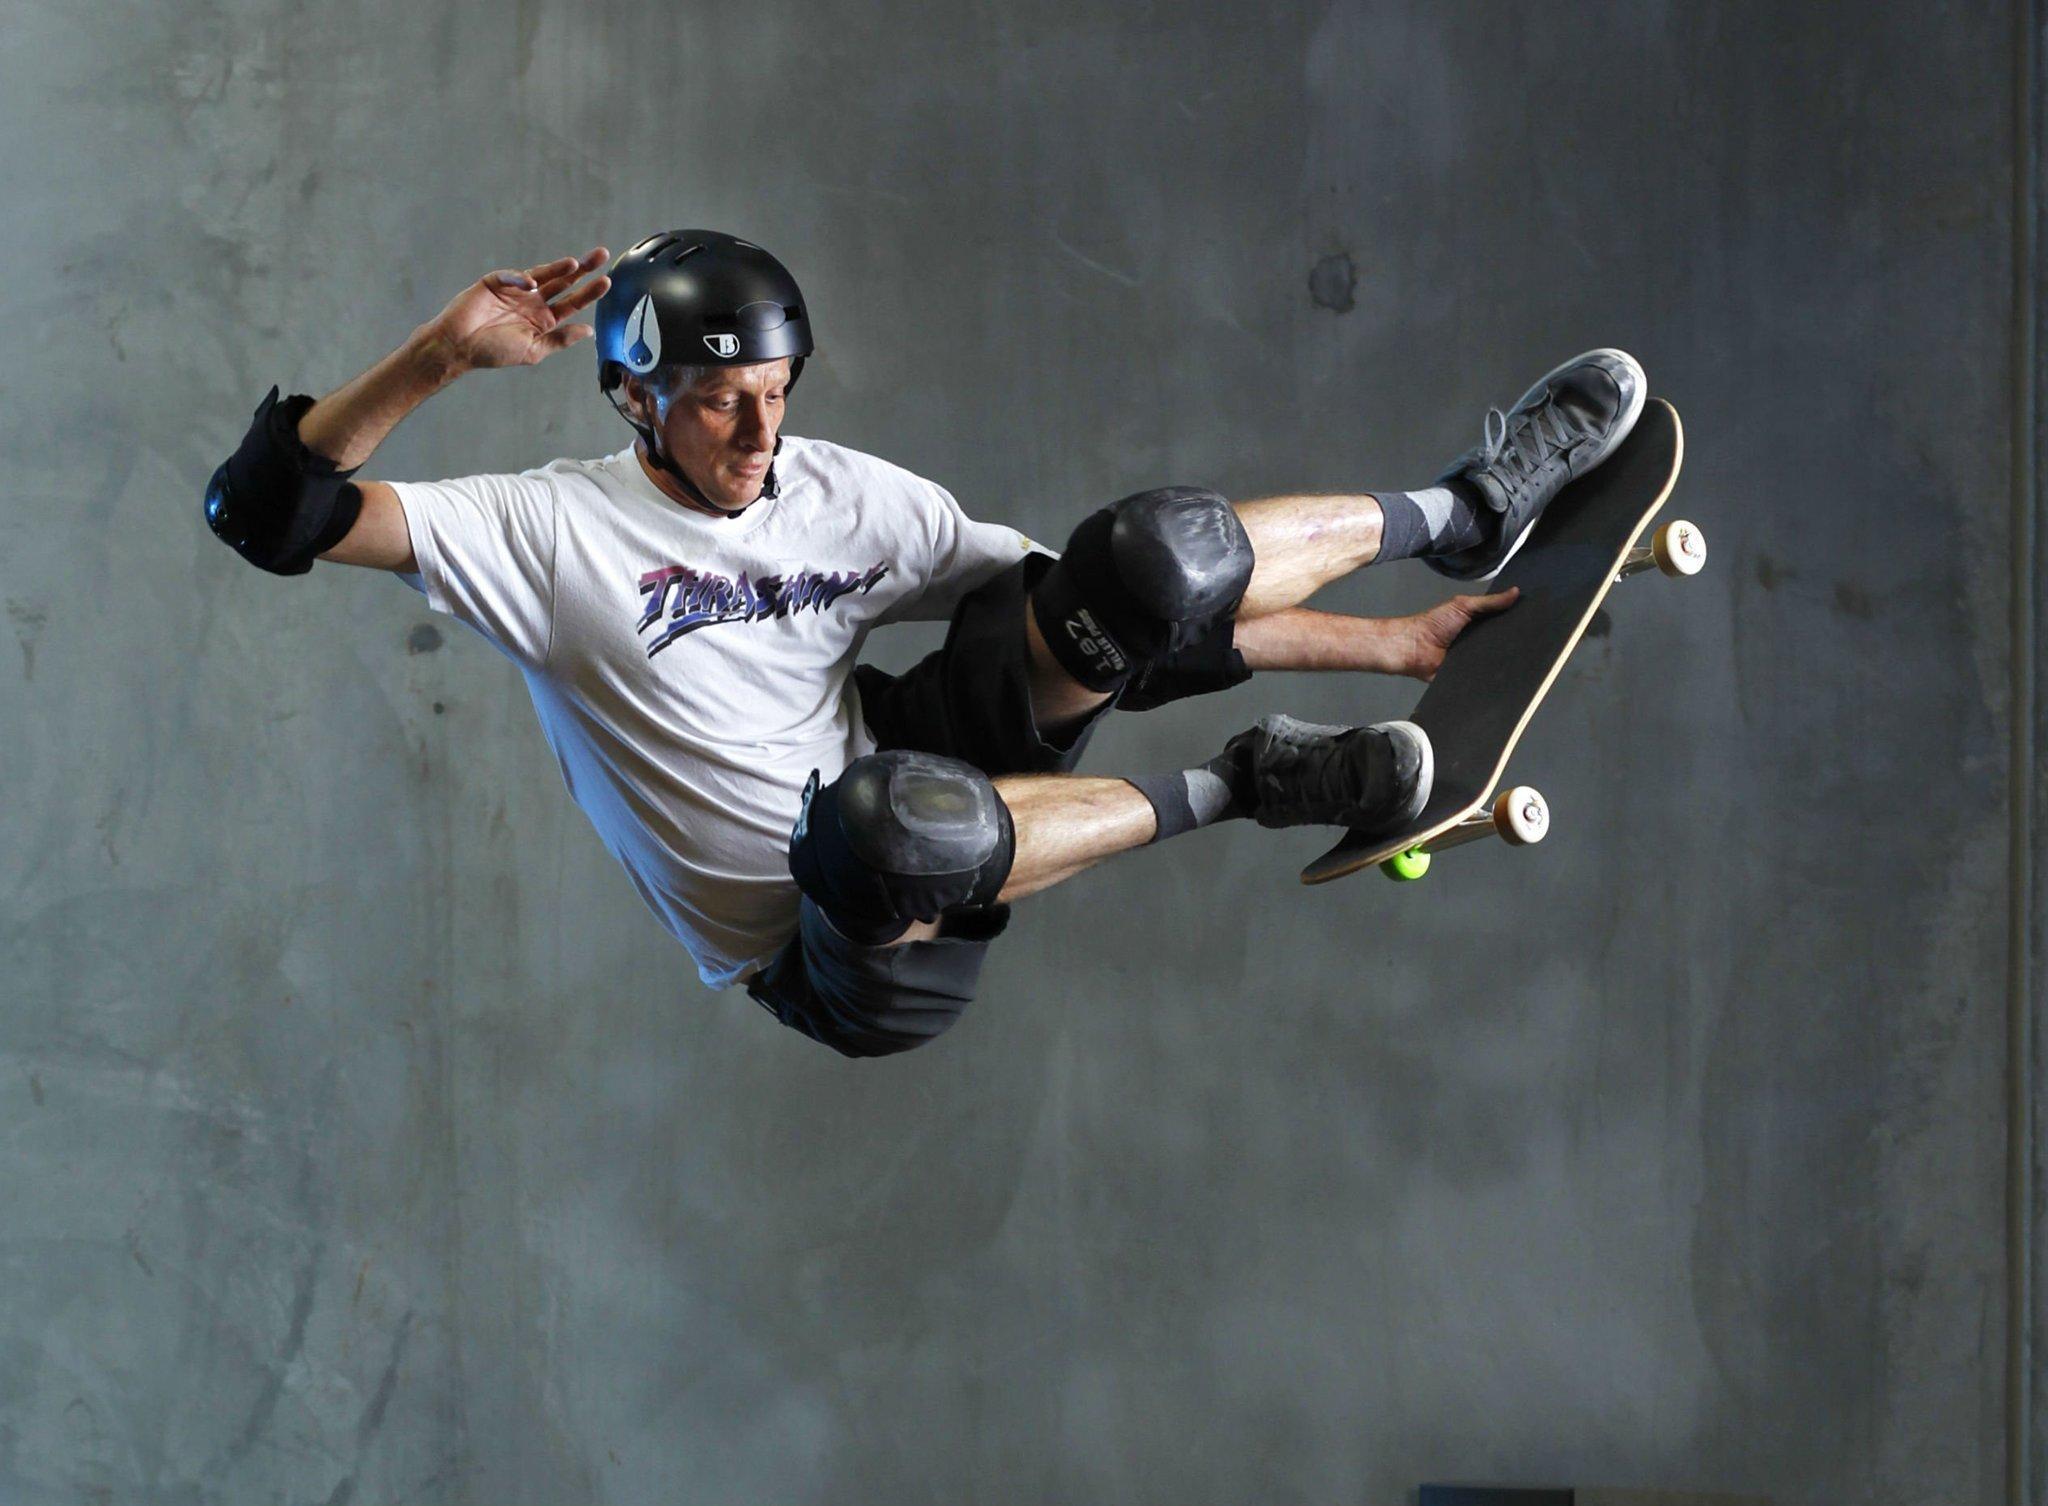 tony hawk has transformed skateboarding into global culture the